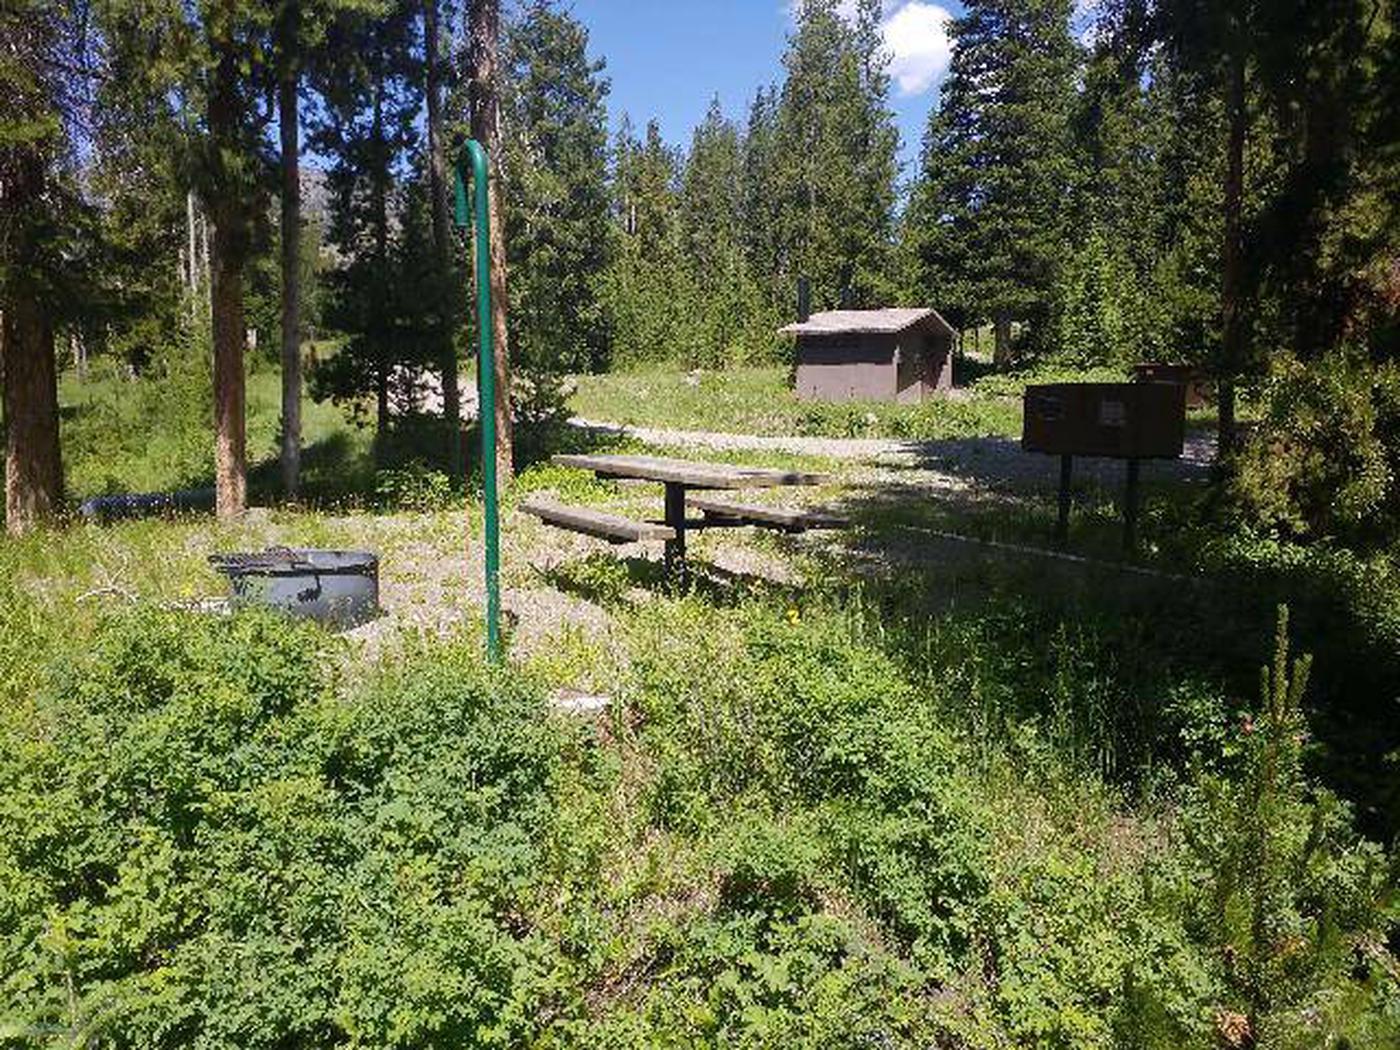 Threemile Campground Campsite 16 - Back View